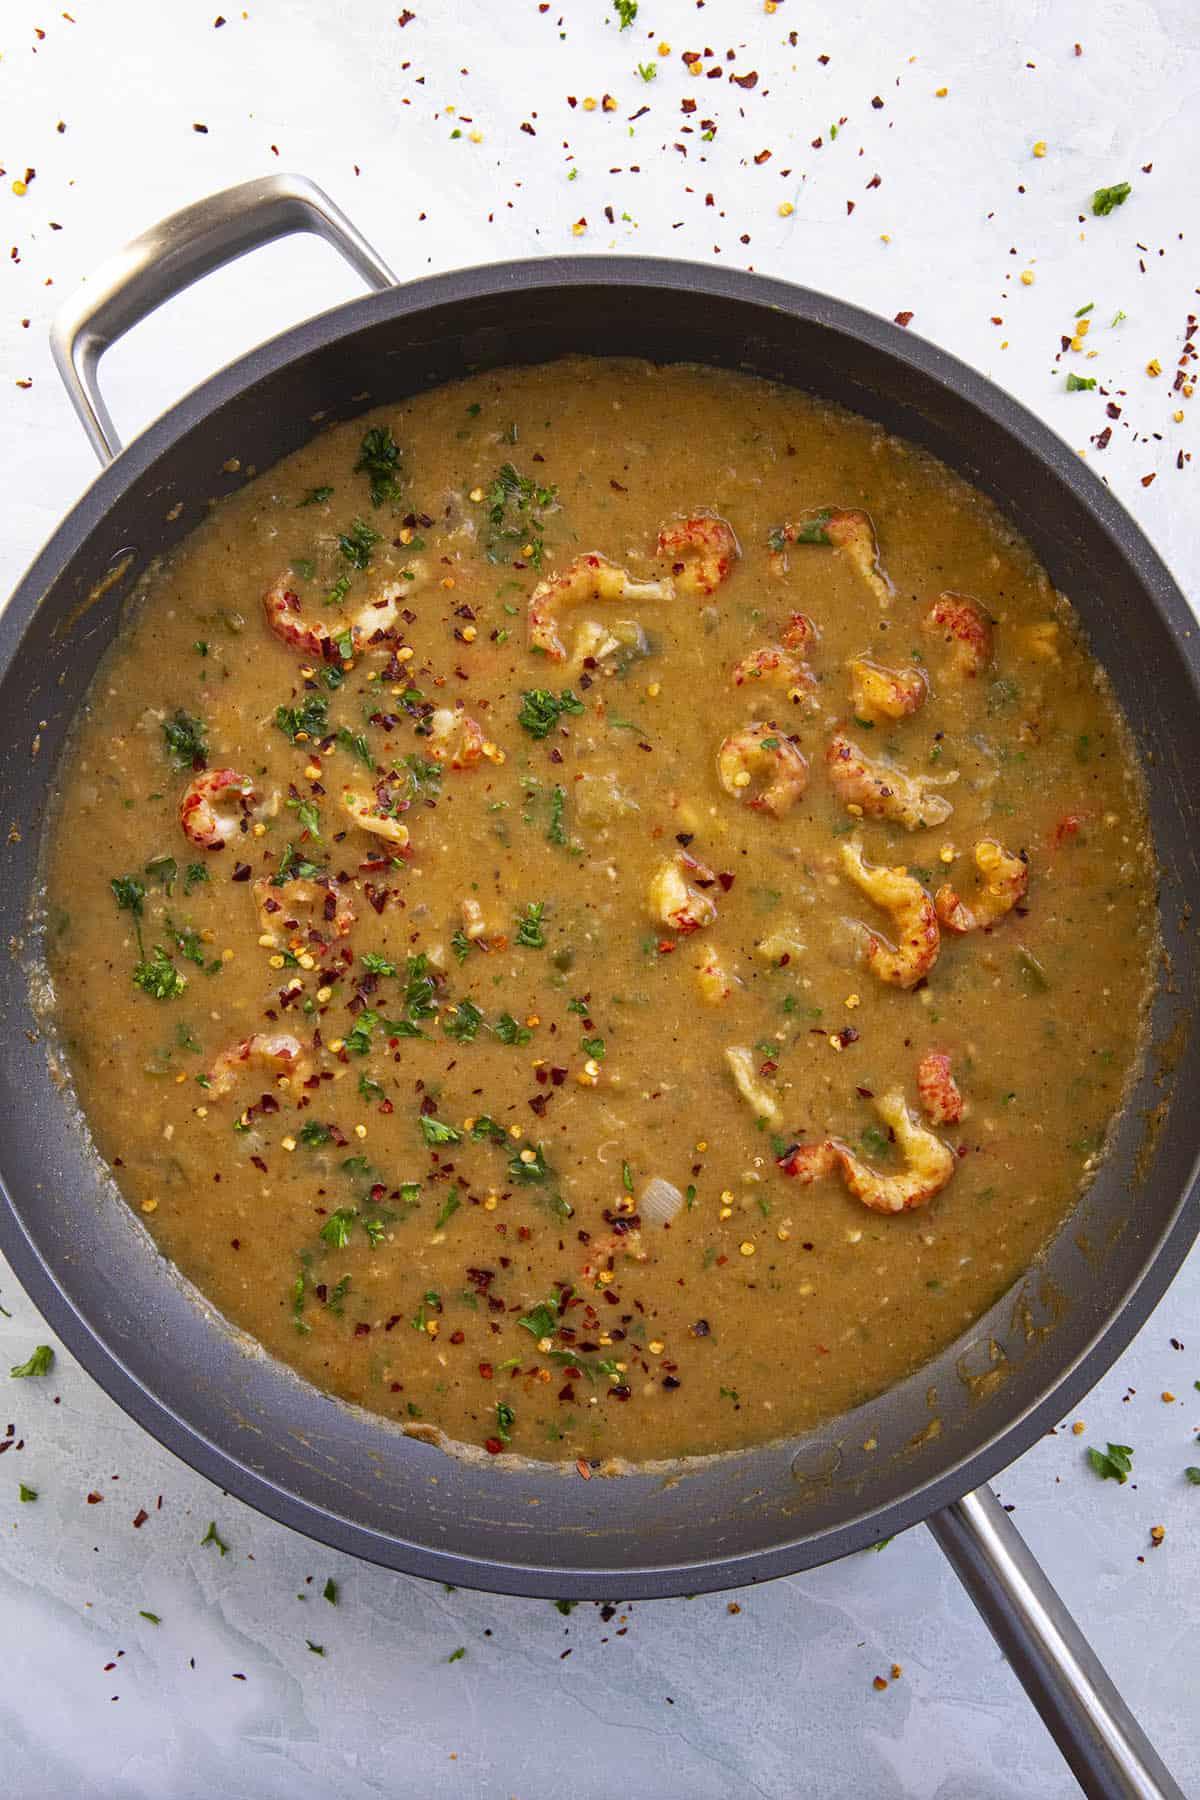 Crawfish Etouffee ready to serve